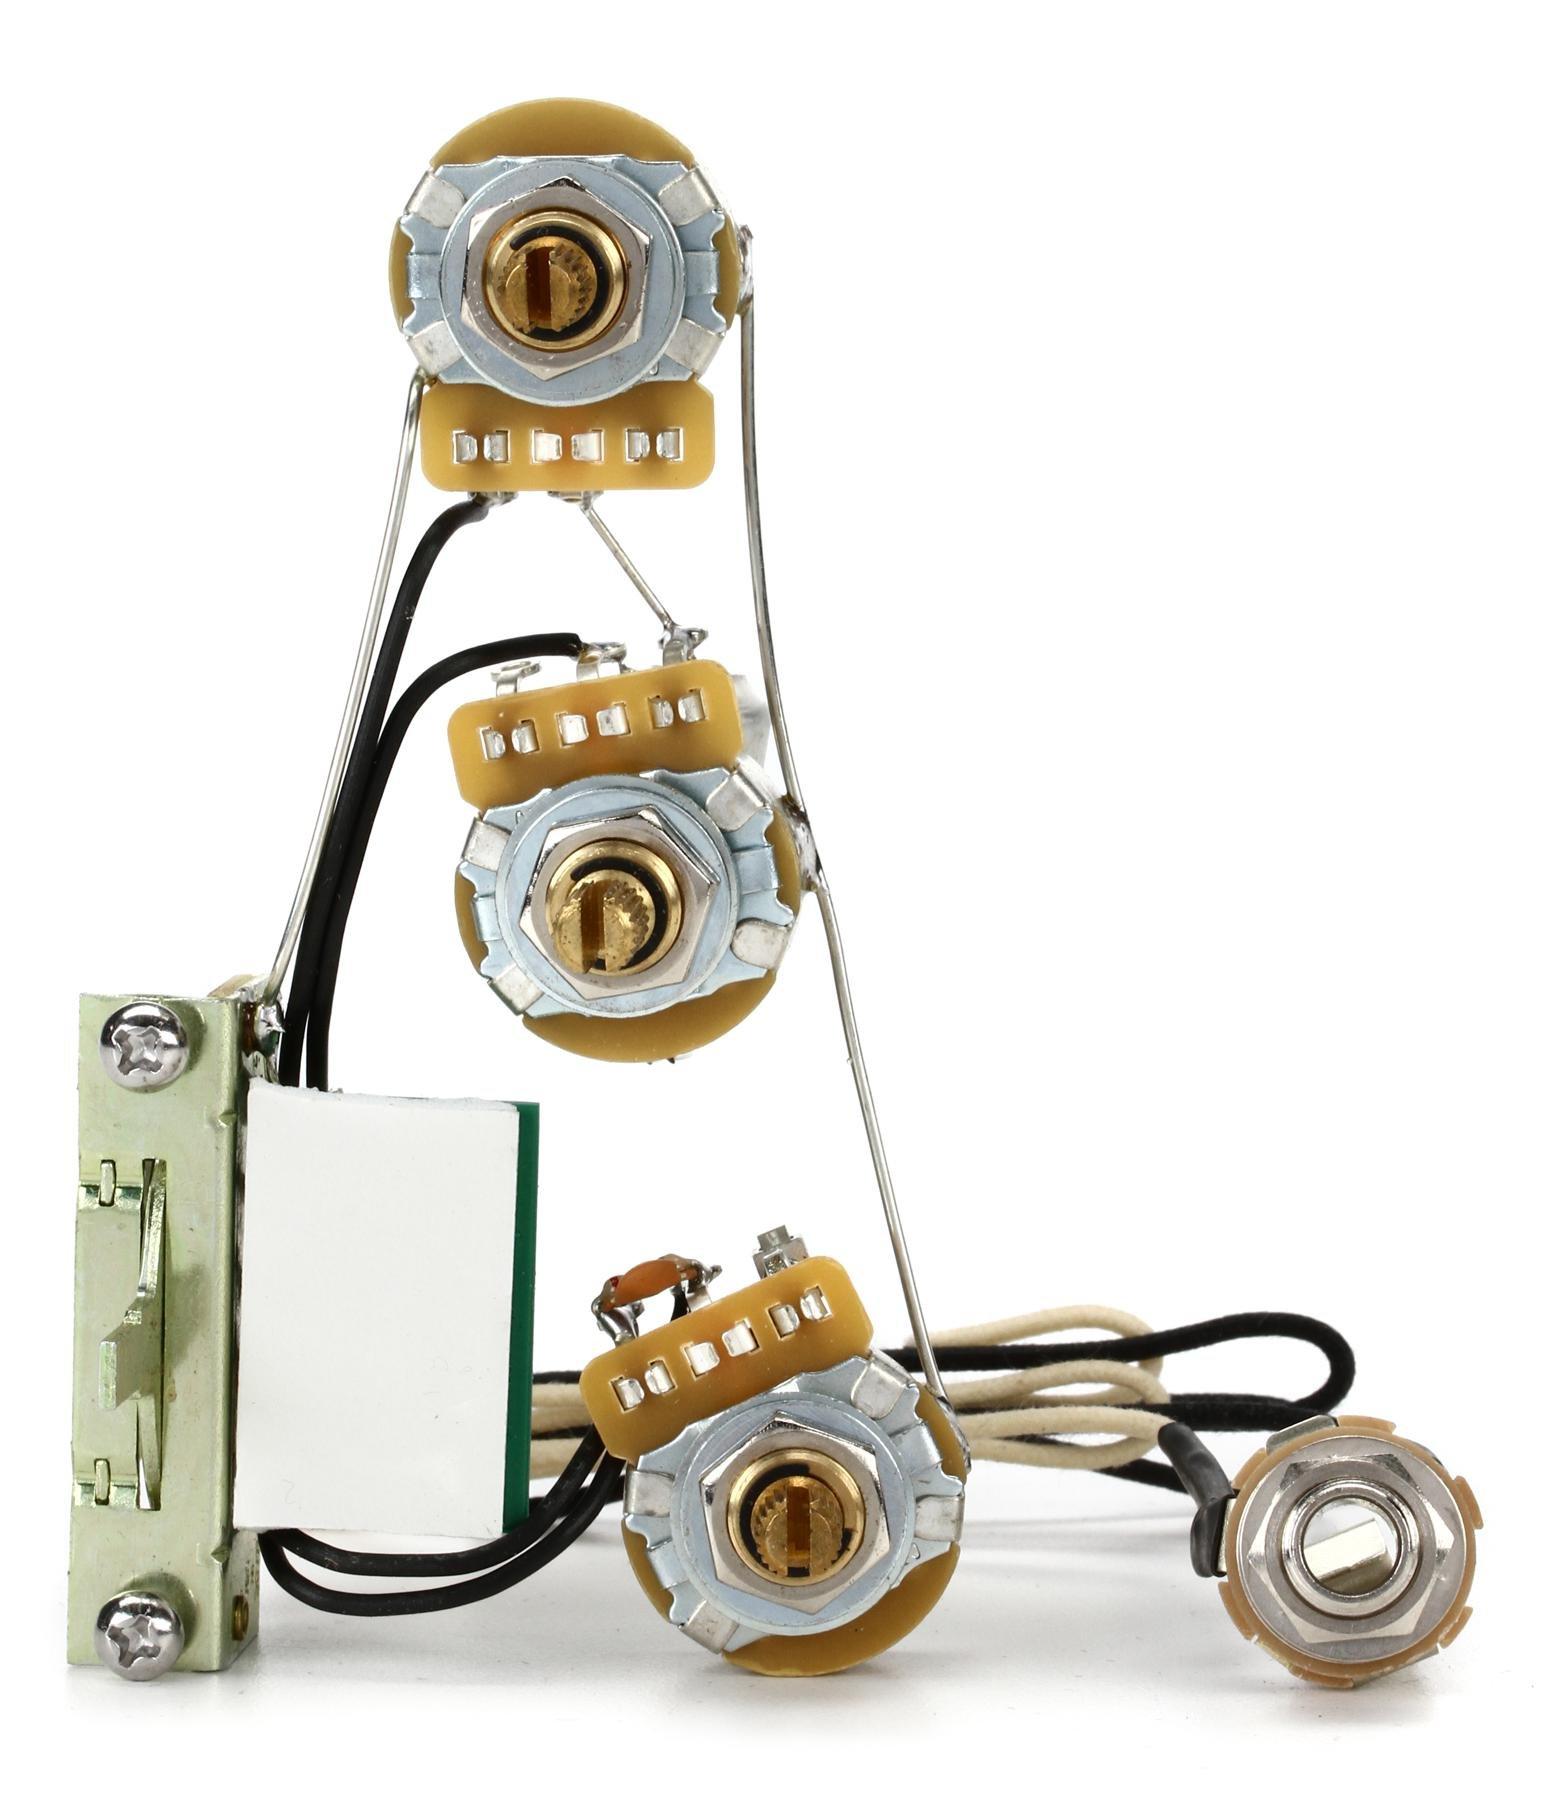 Mojo Tone Solderless Strat Wiring Harness Standard Sweetwater Guitar For Dummies Image 1